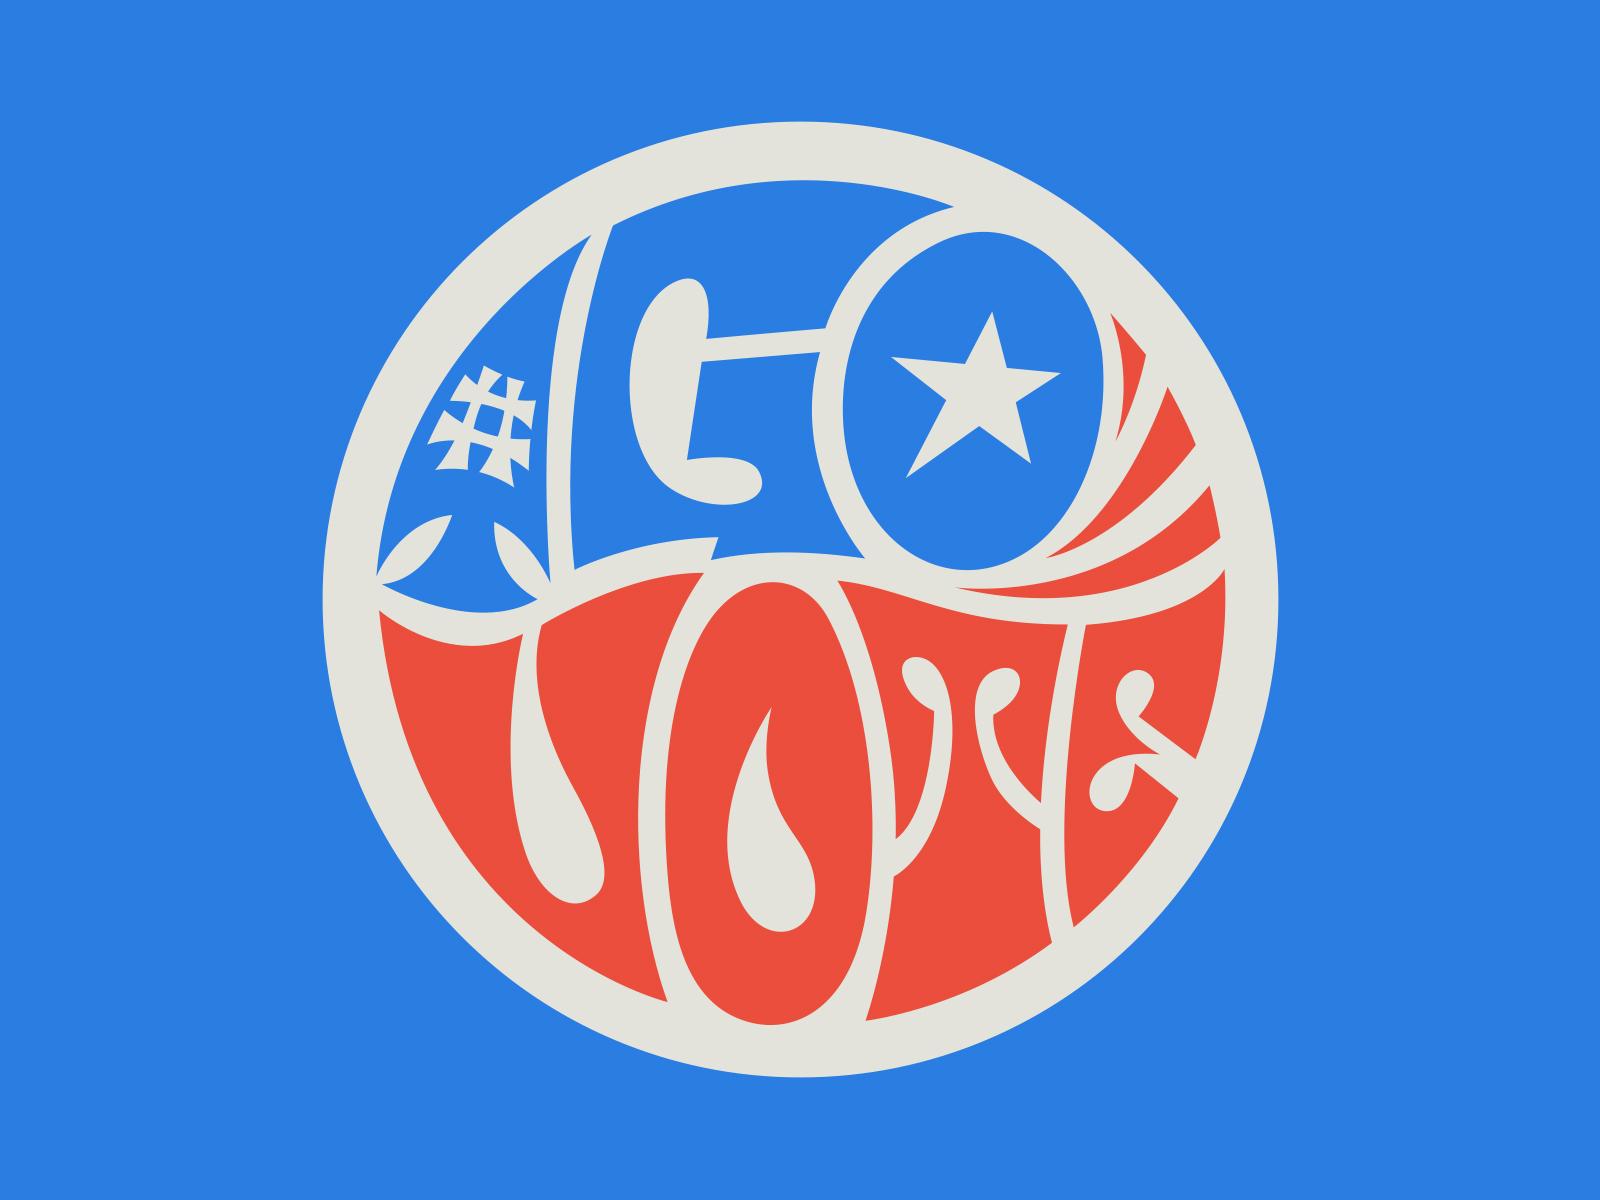 Govote election america usa kendrickkidd